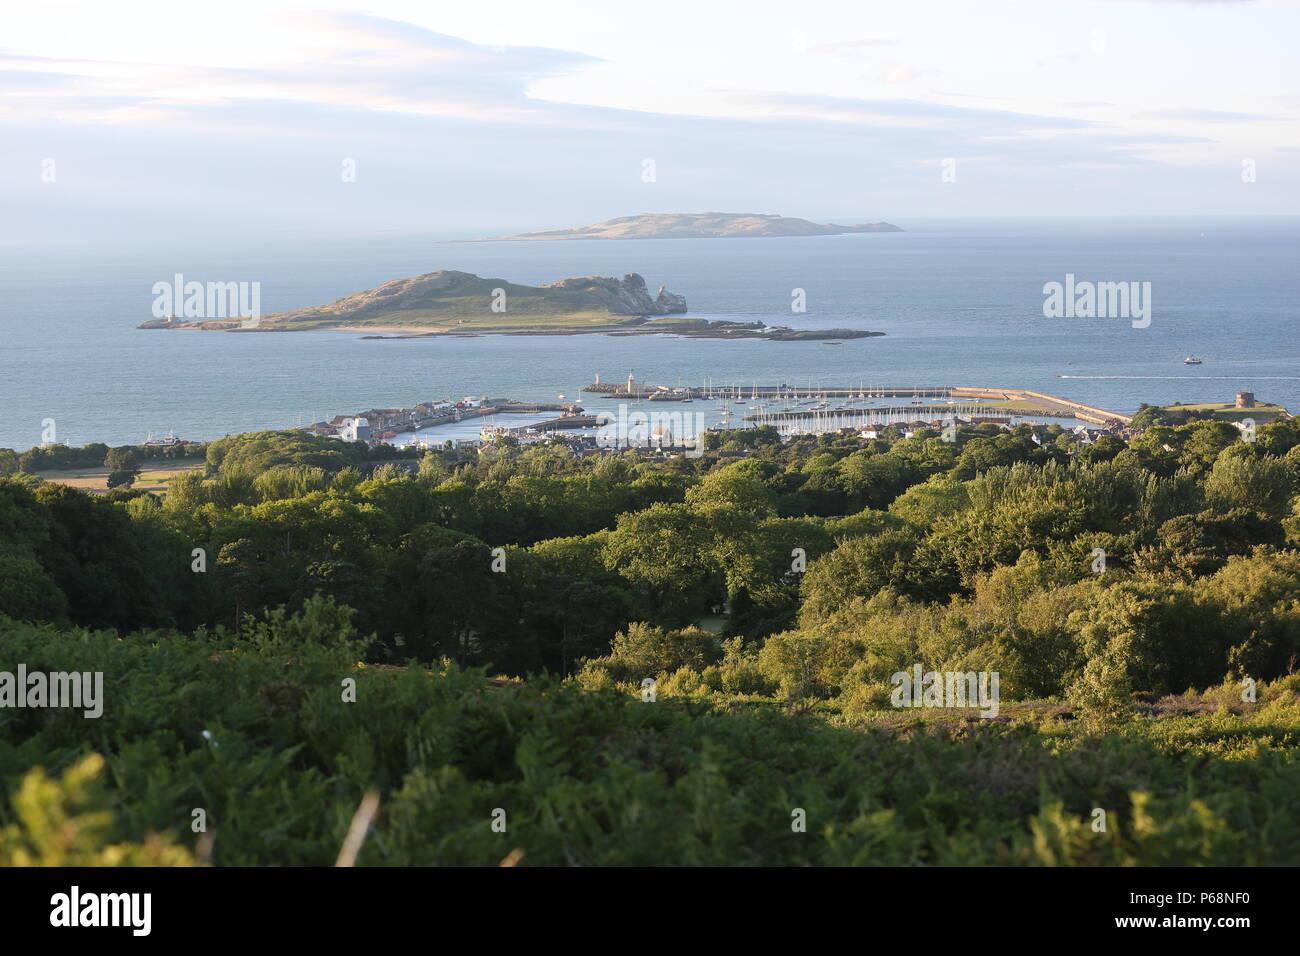 View of Howth harbor from Shielmartin hill. Co. Dublin - Stock Image